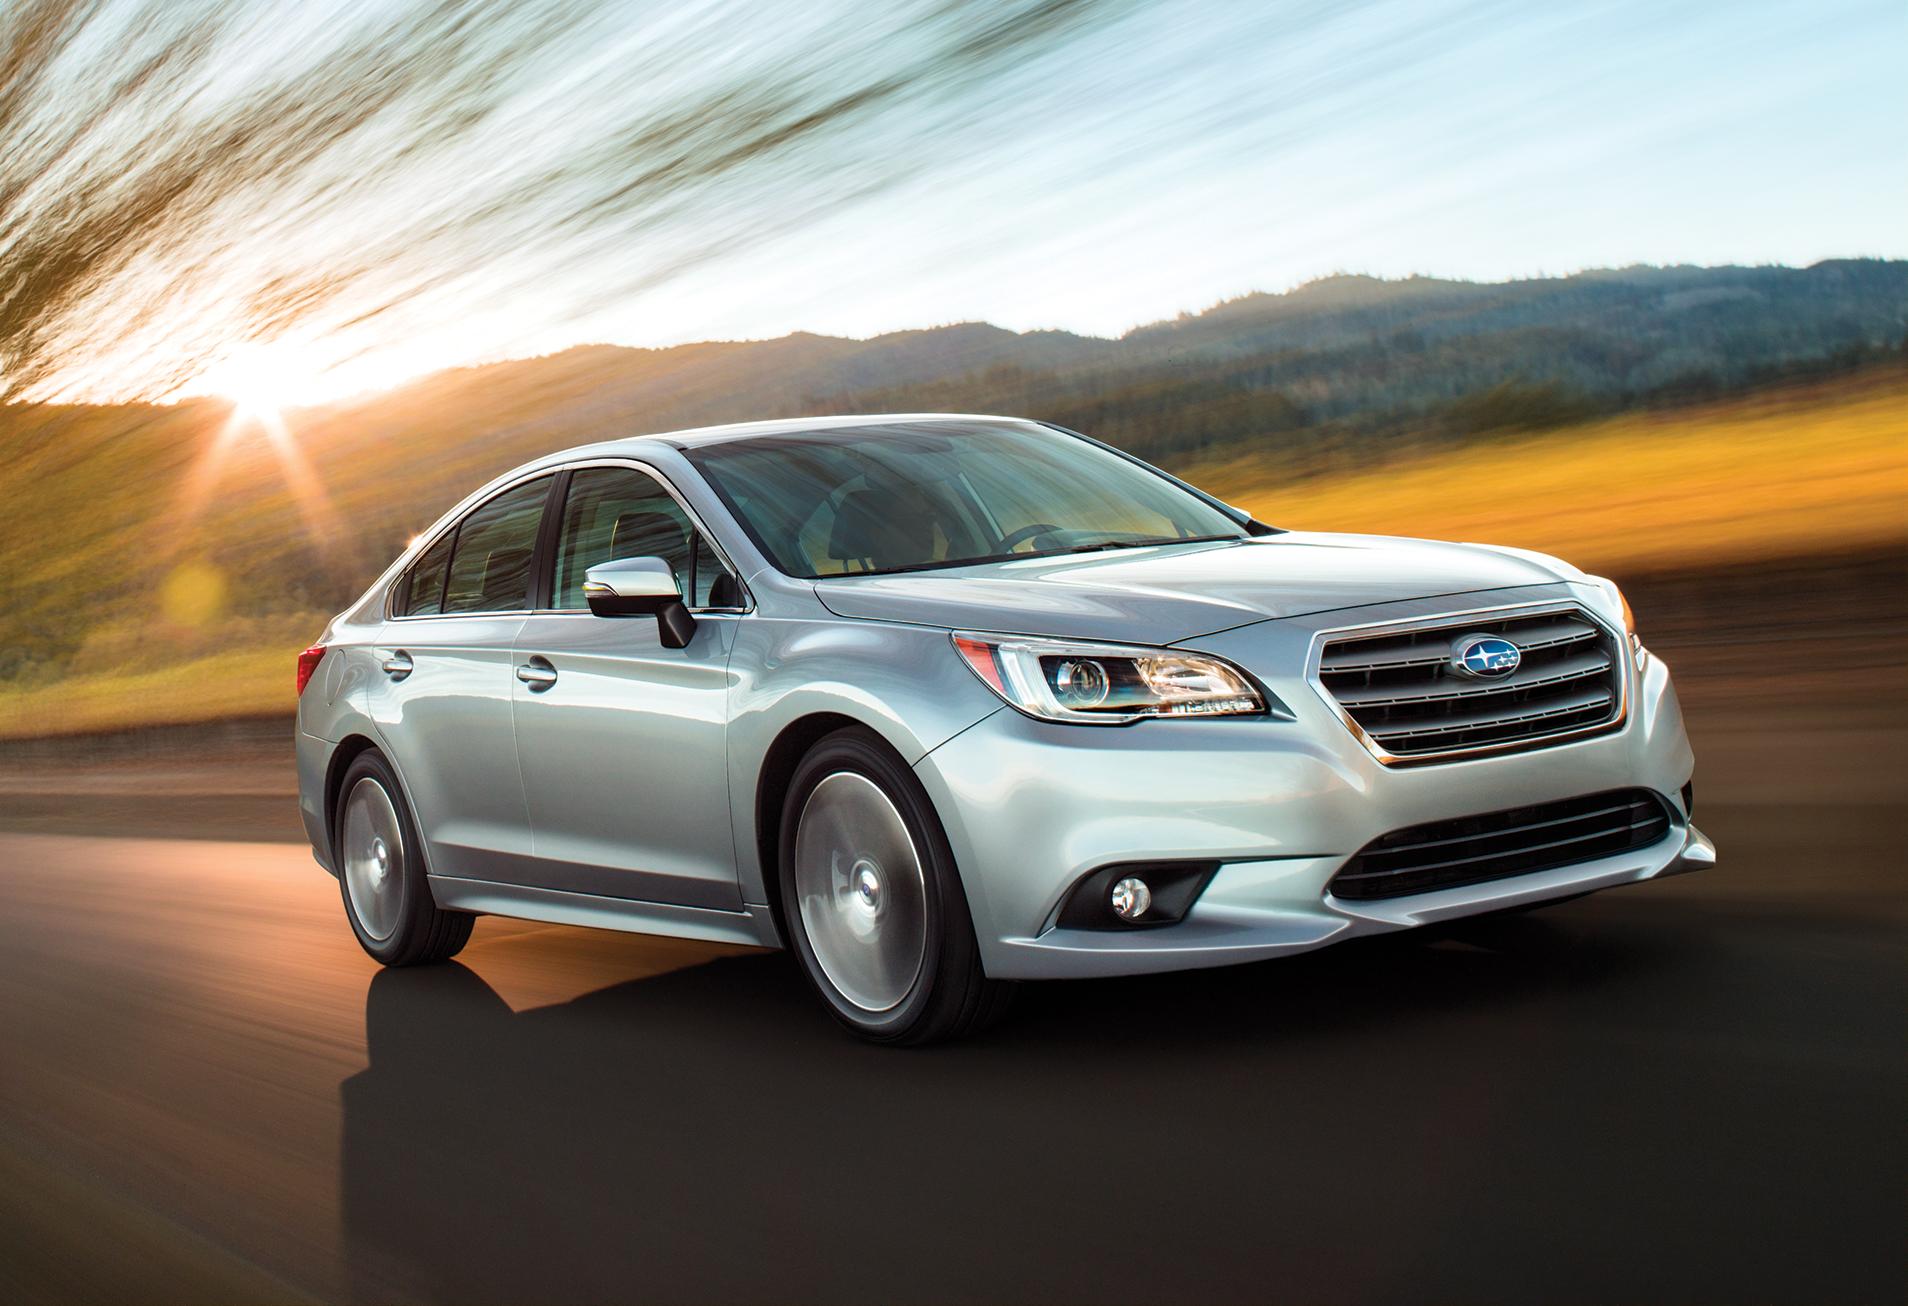 Subaru Legacy - Website for the launch of the 2017 Subaru Legacy